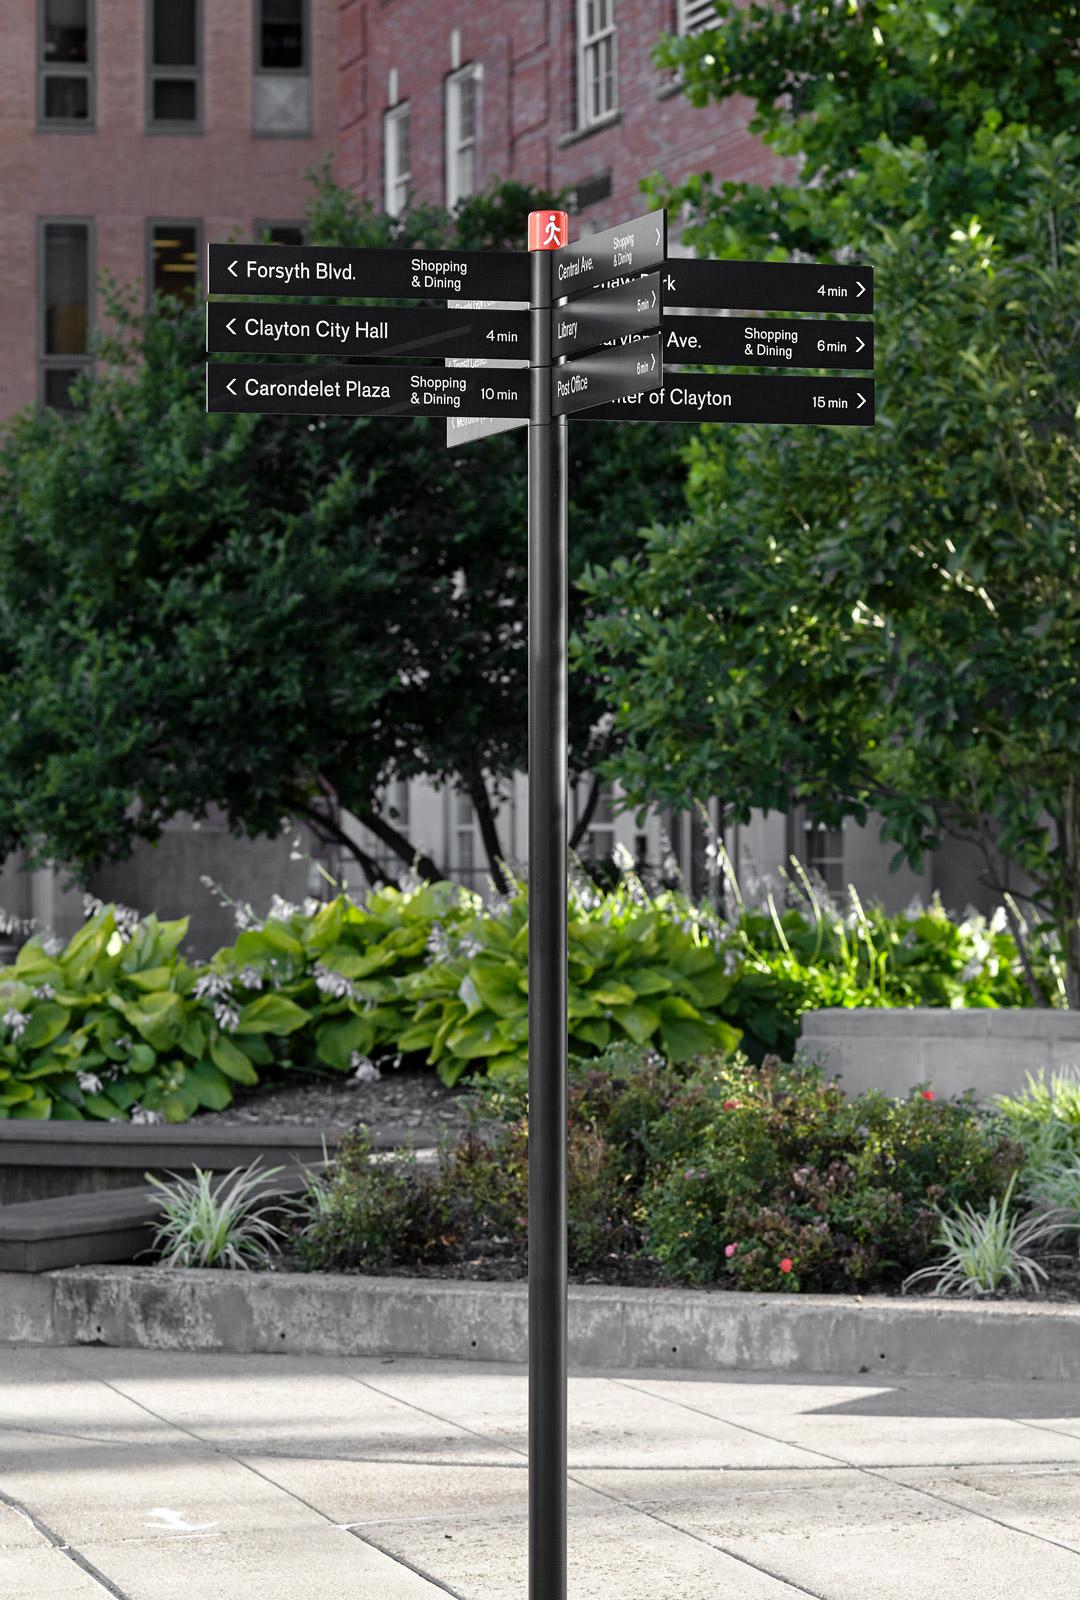 Clayton城市导向设计 © kikuobata